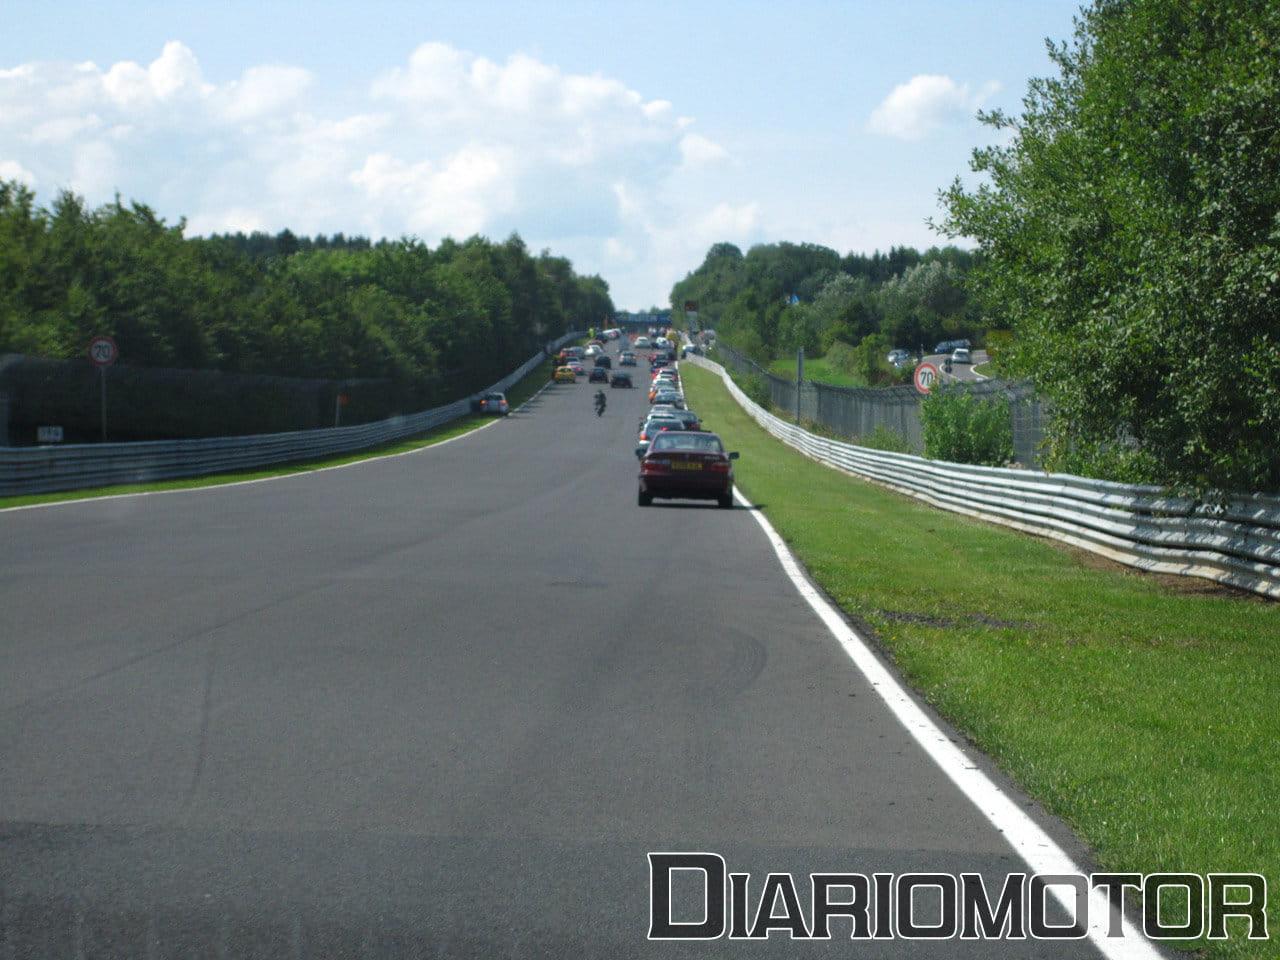 Destino Nürburgring: nos vamos al Infierno Verde